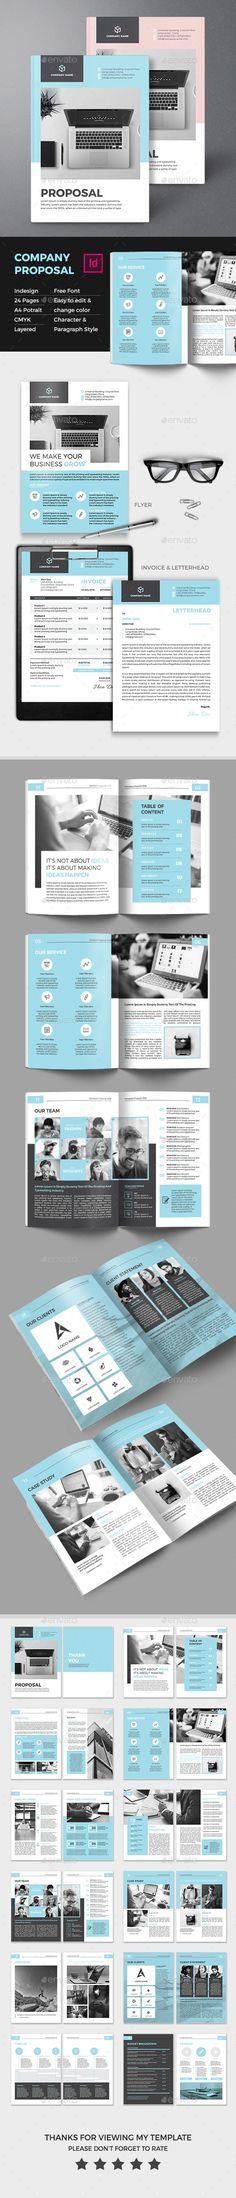 proposal cover designs - Google Search | Graphic Design - Report ...